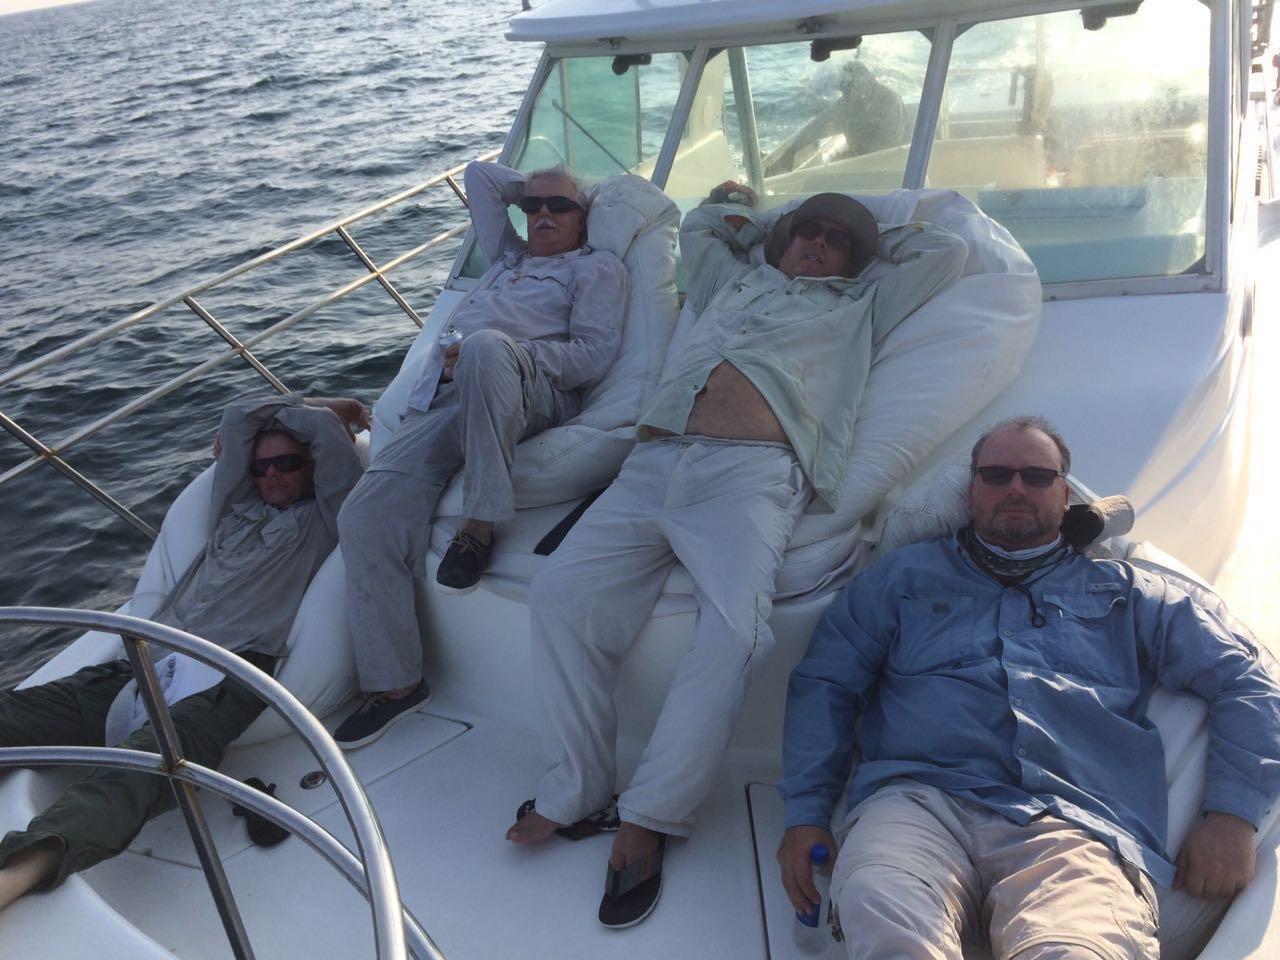 Mothership stay at panama sport fishing lodge group of men